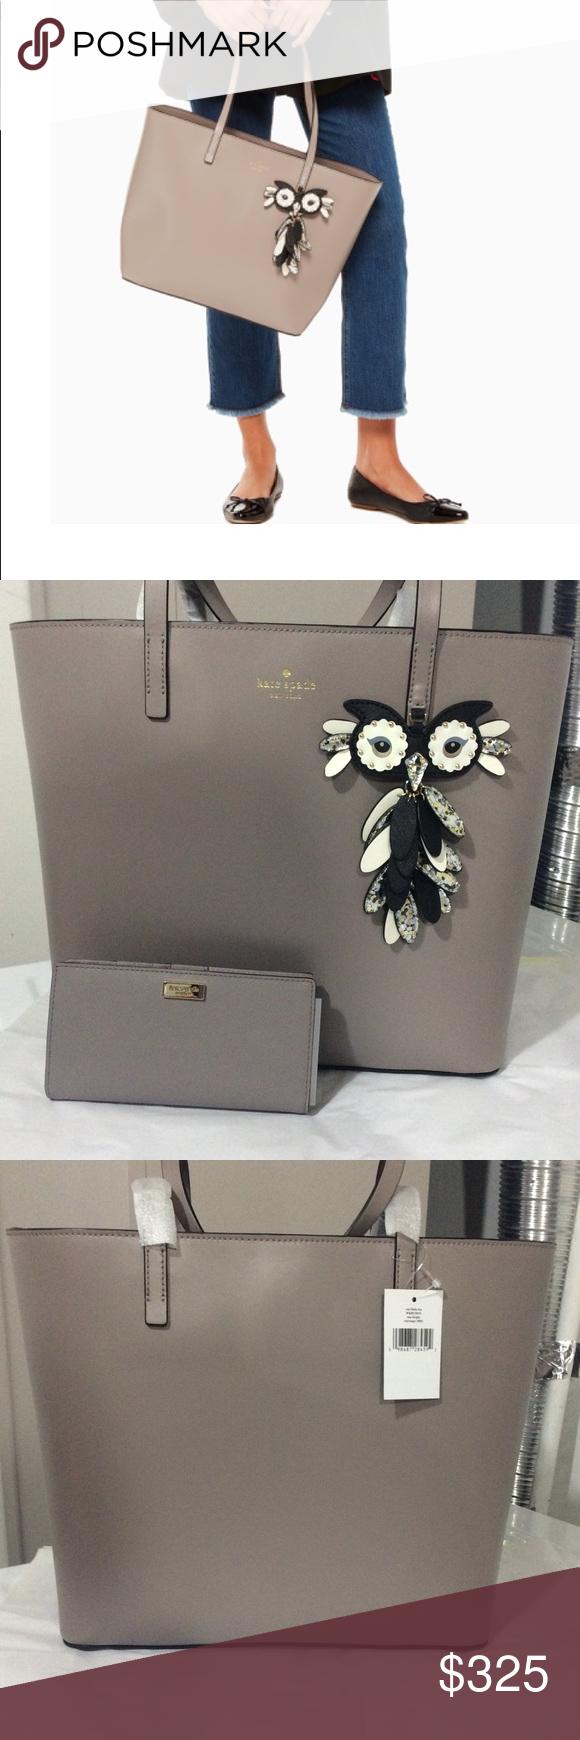 2d6c134f4 Dust Bag · Soft Leather · Kate Spade ♤ Star Bright Owl Little Len 🖤 Super  Gorgeous & Whimsical!